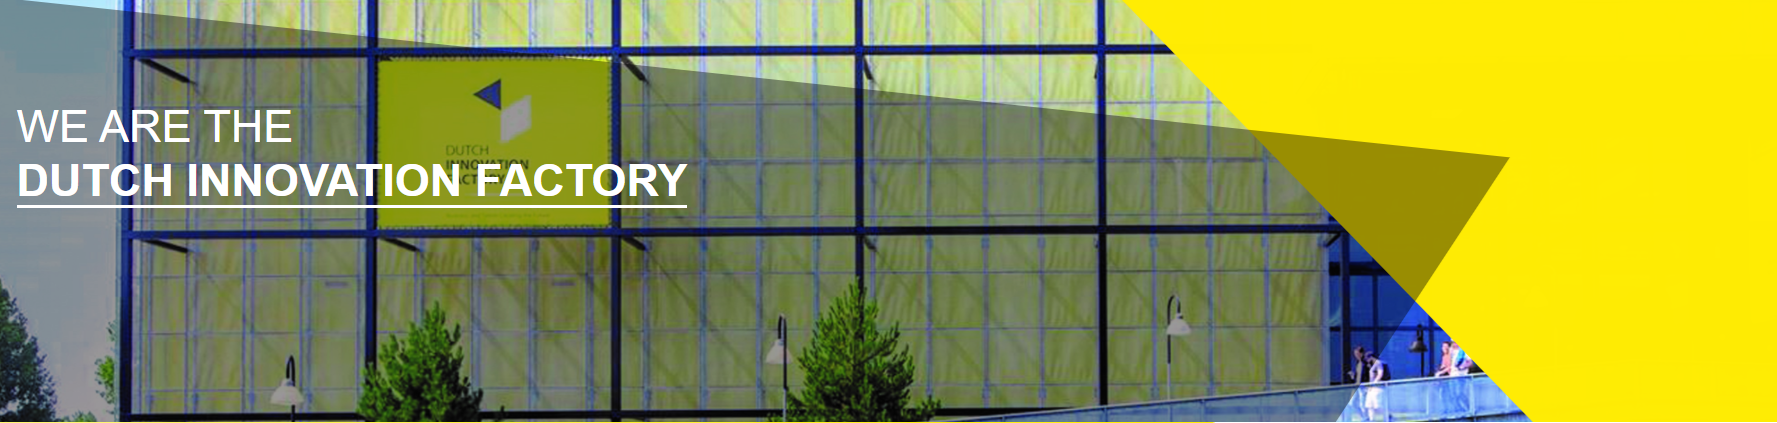 Dutch Innovation Factory community